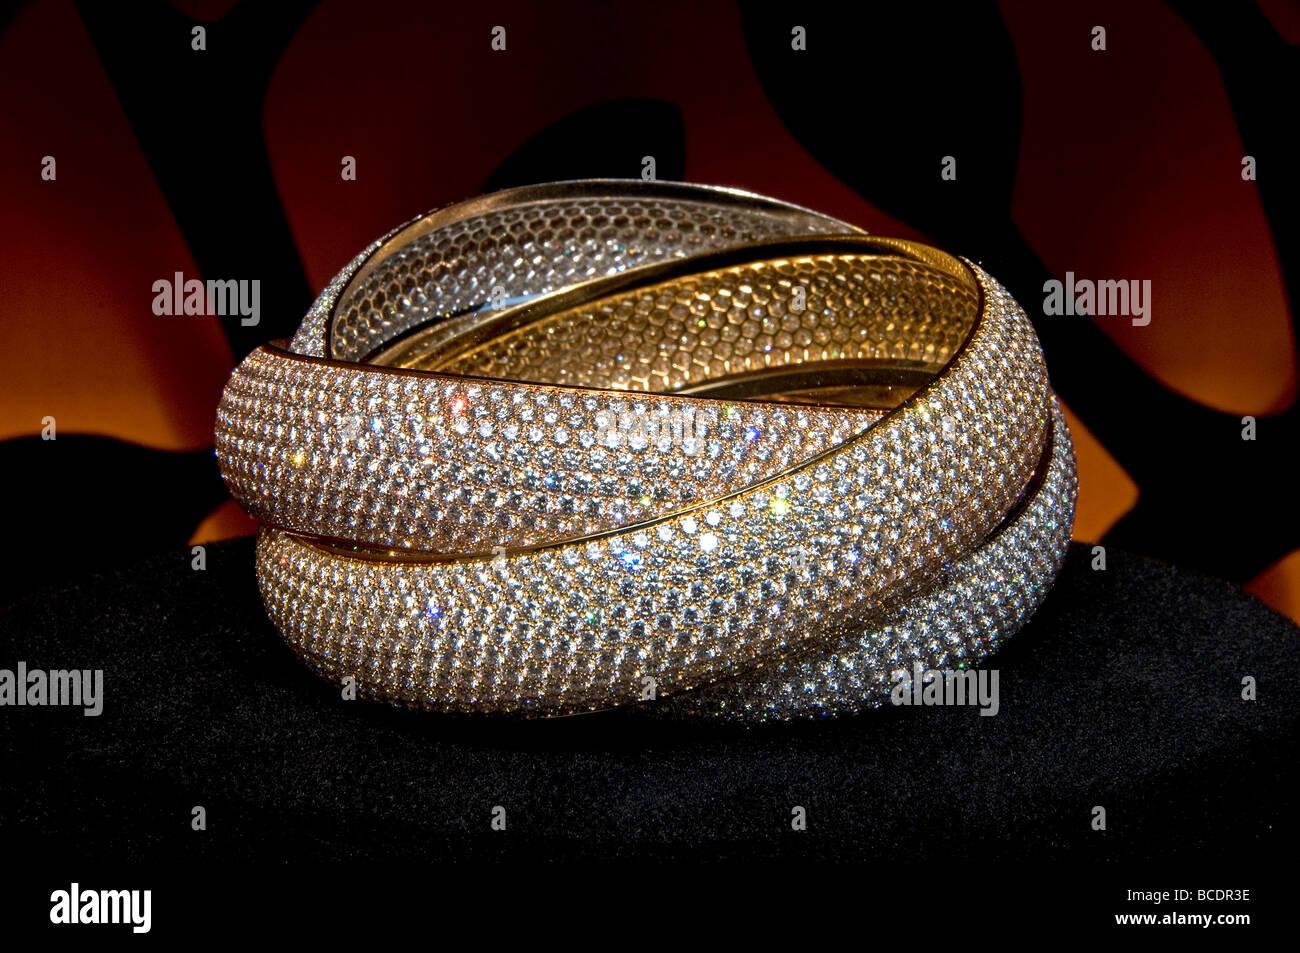 Cartier Place Vendome Paris France  jeweler jewel - Stock Image